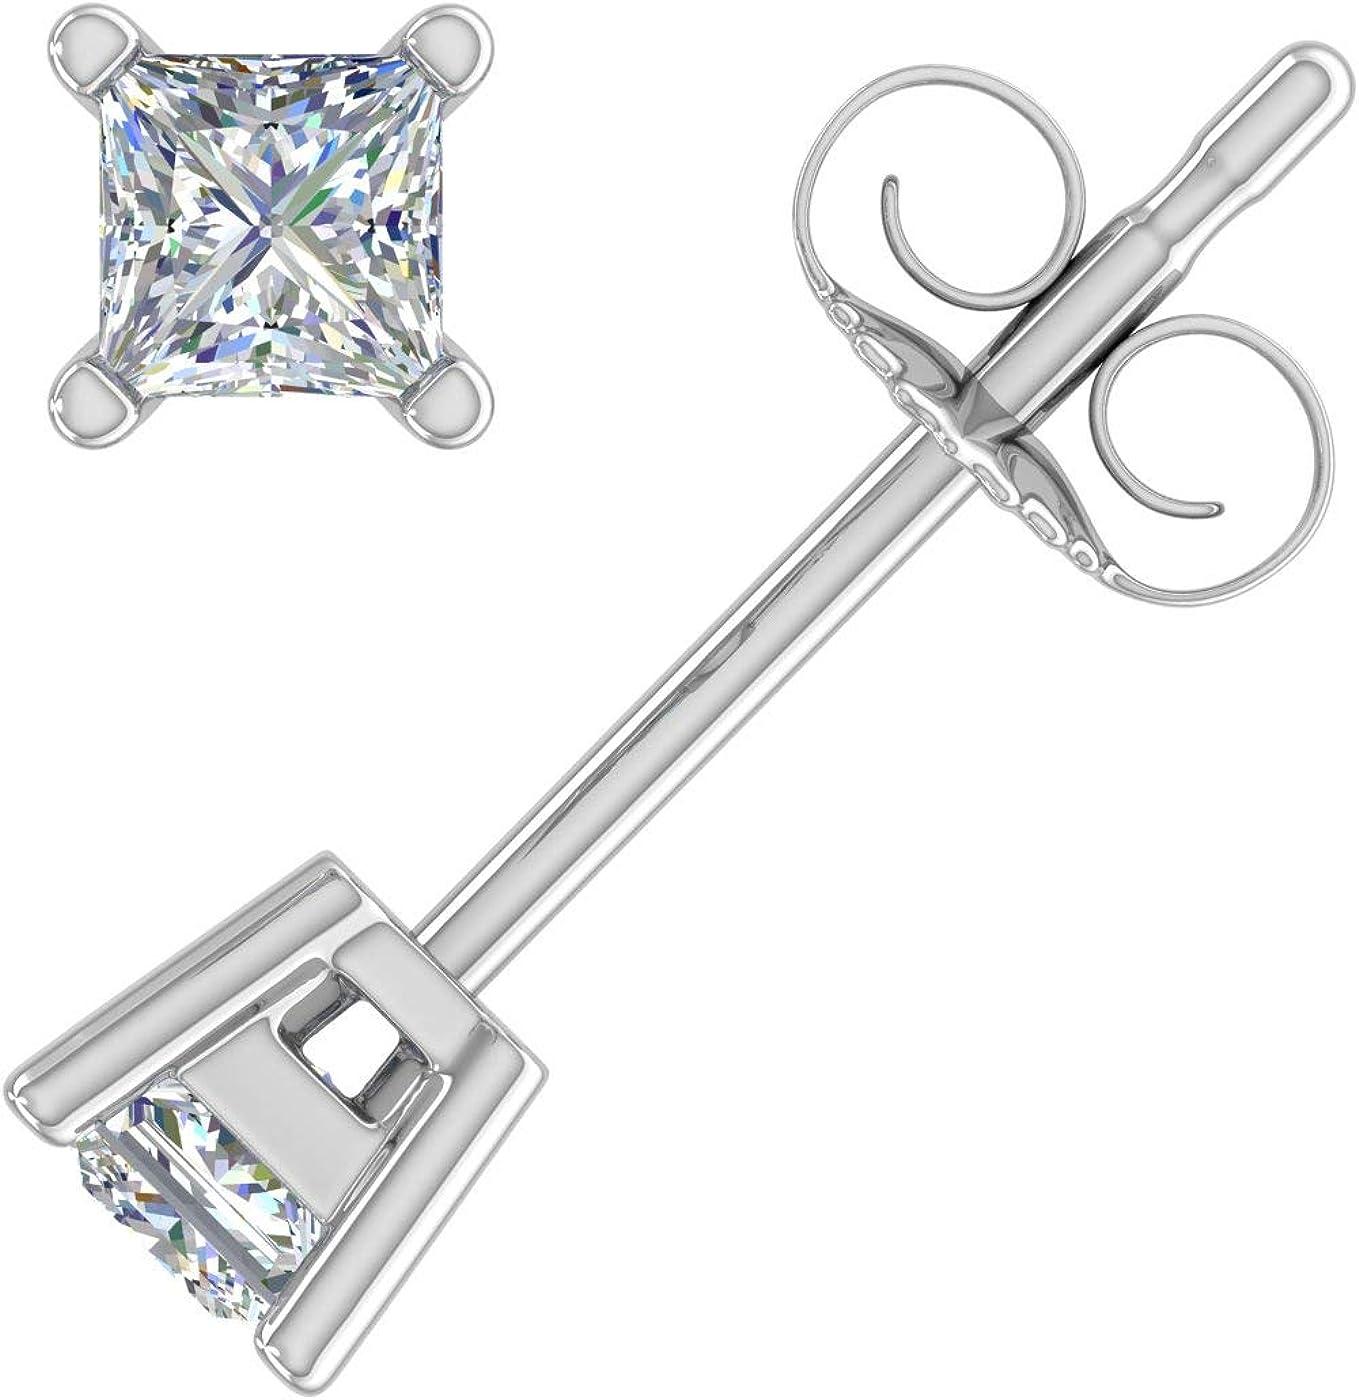 1 10 Carat to 4 Bombing new work Princess Over item handling 14 Earrings in Diamond Stud Cut